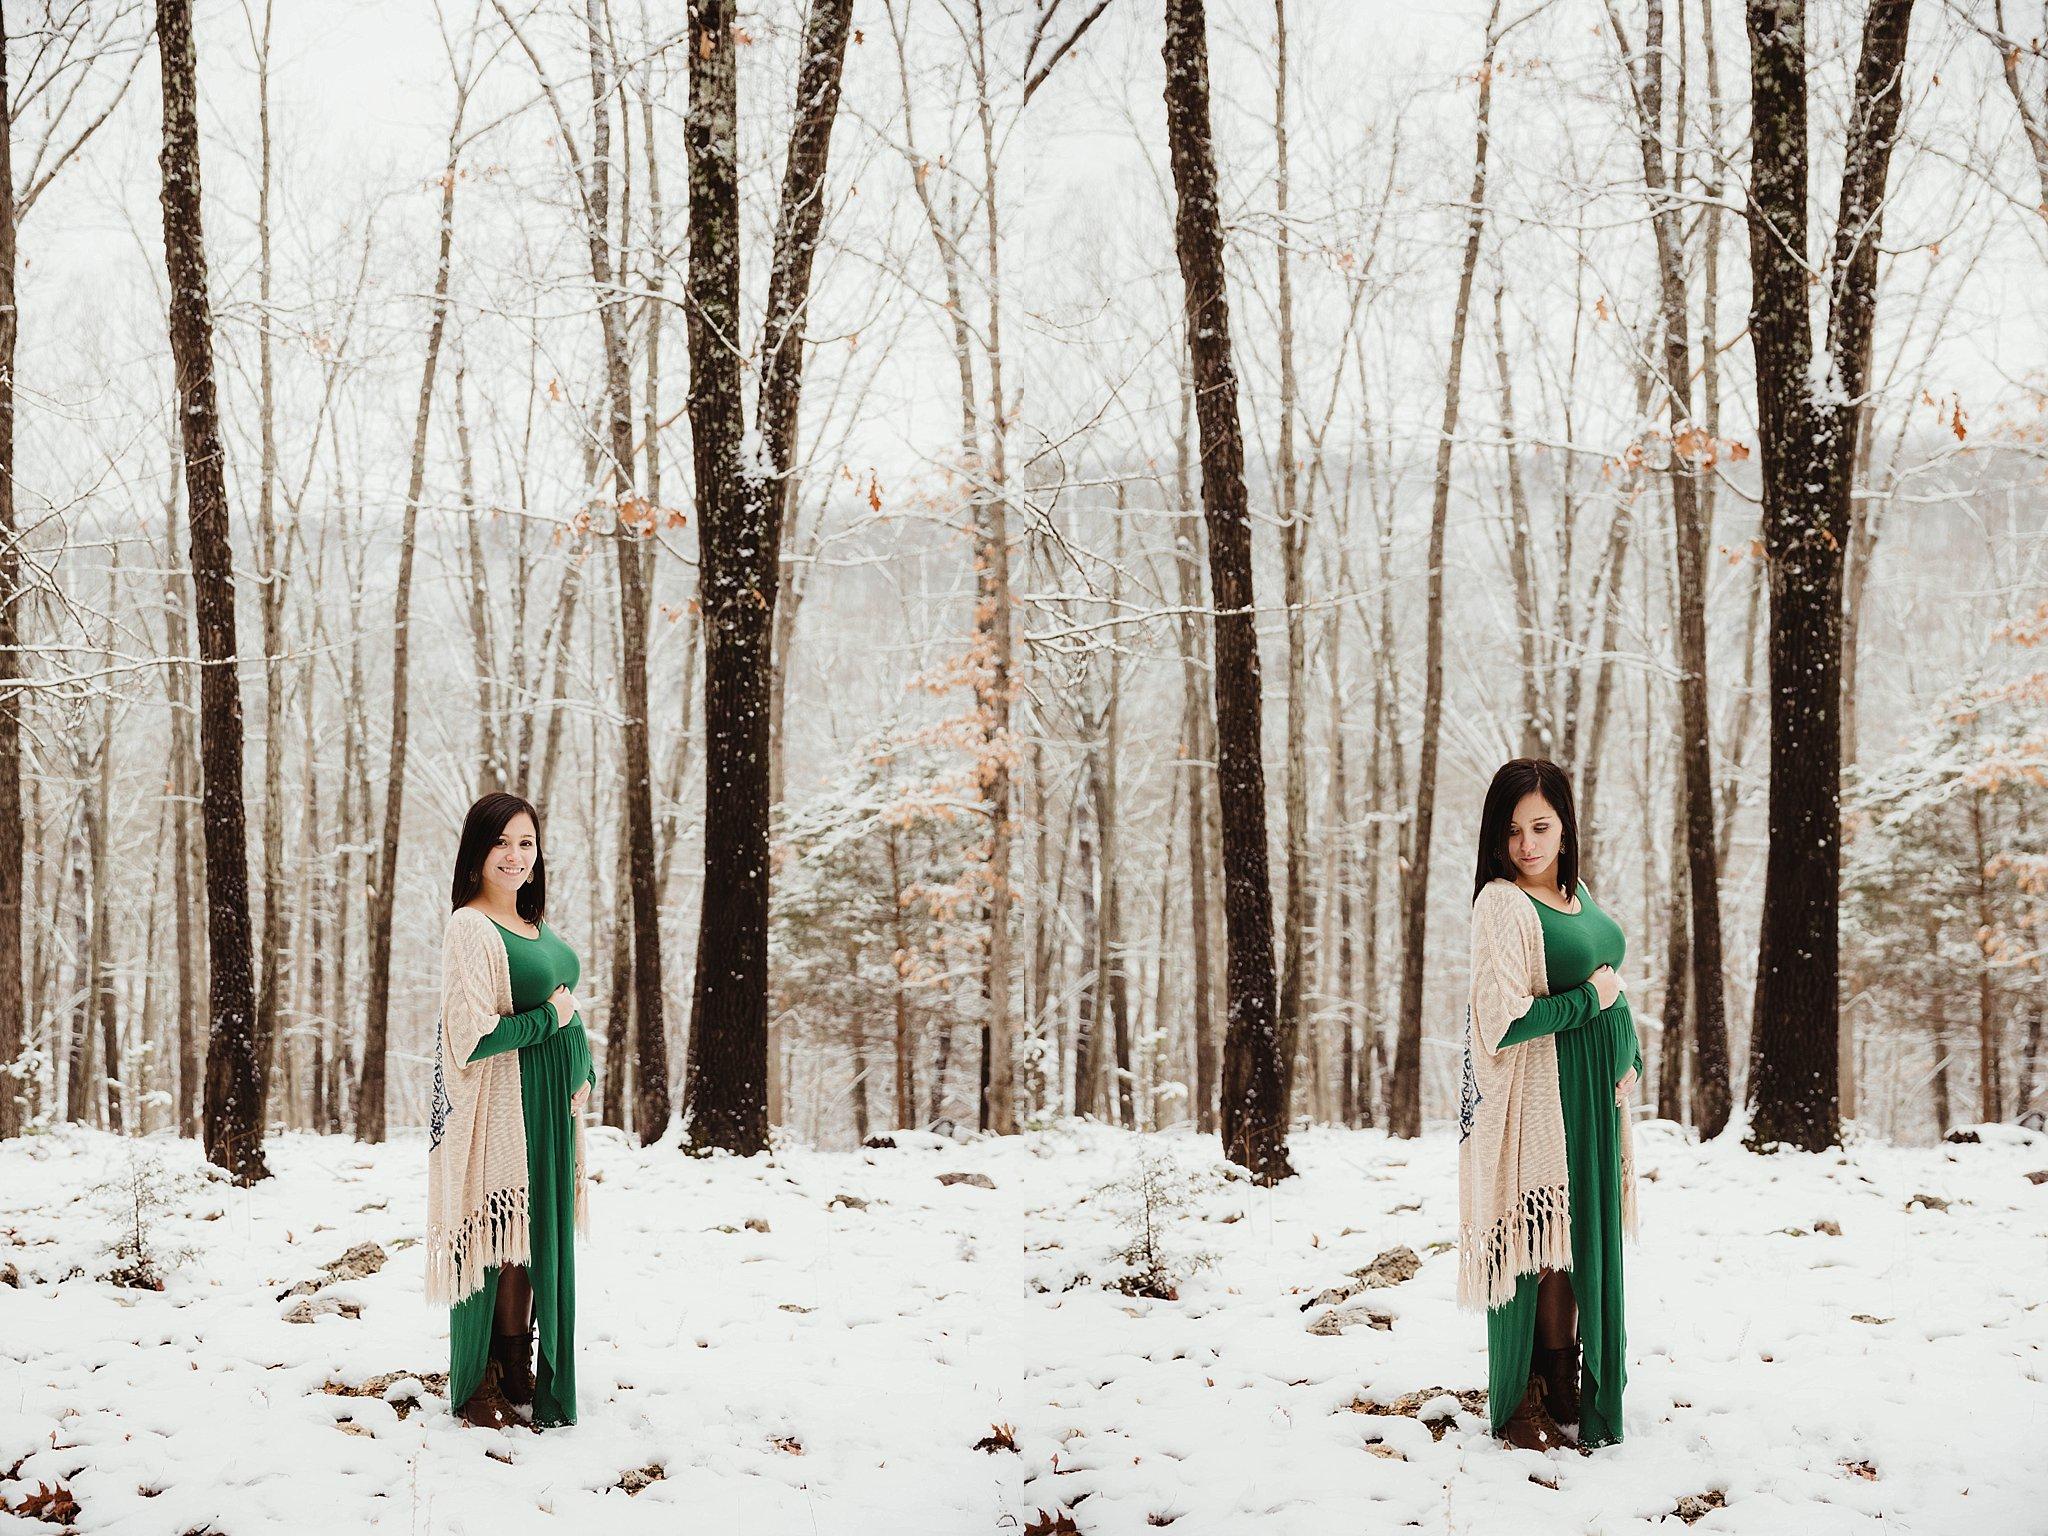 20181227-maternity-photo-outdoor-snow-newborn-picture-best-baby-photographer-missouri-camdenton-04.jpg